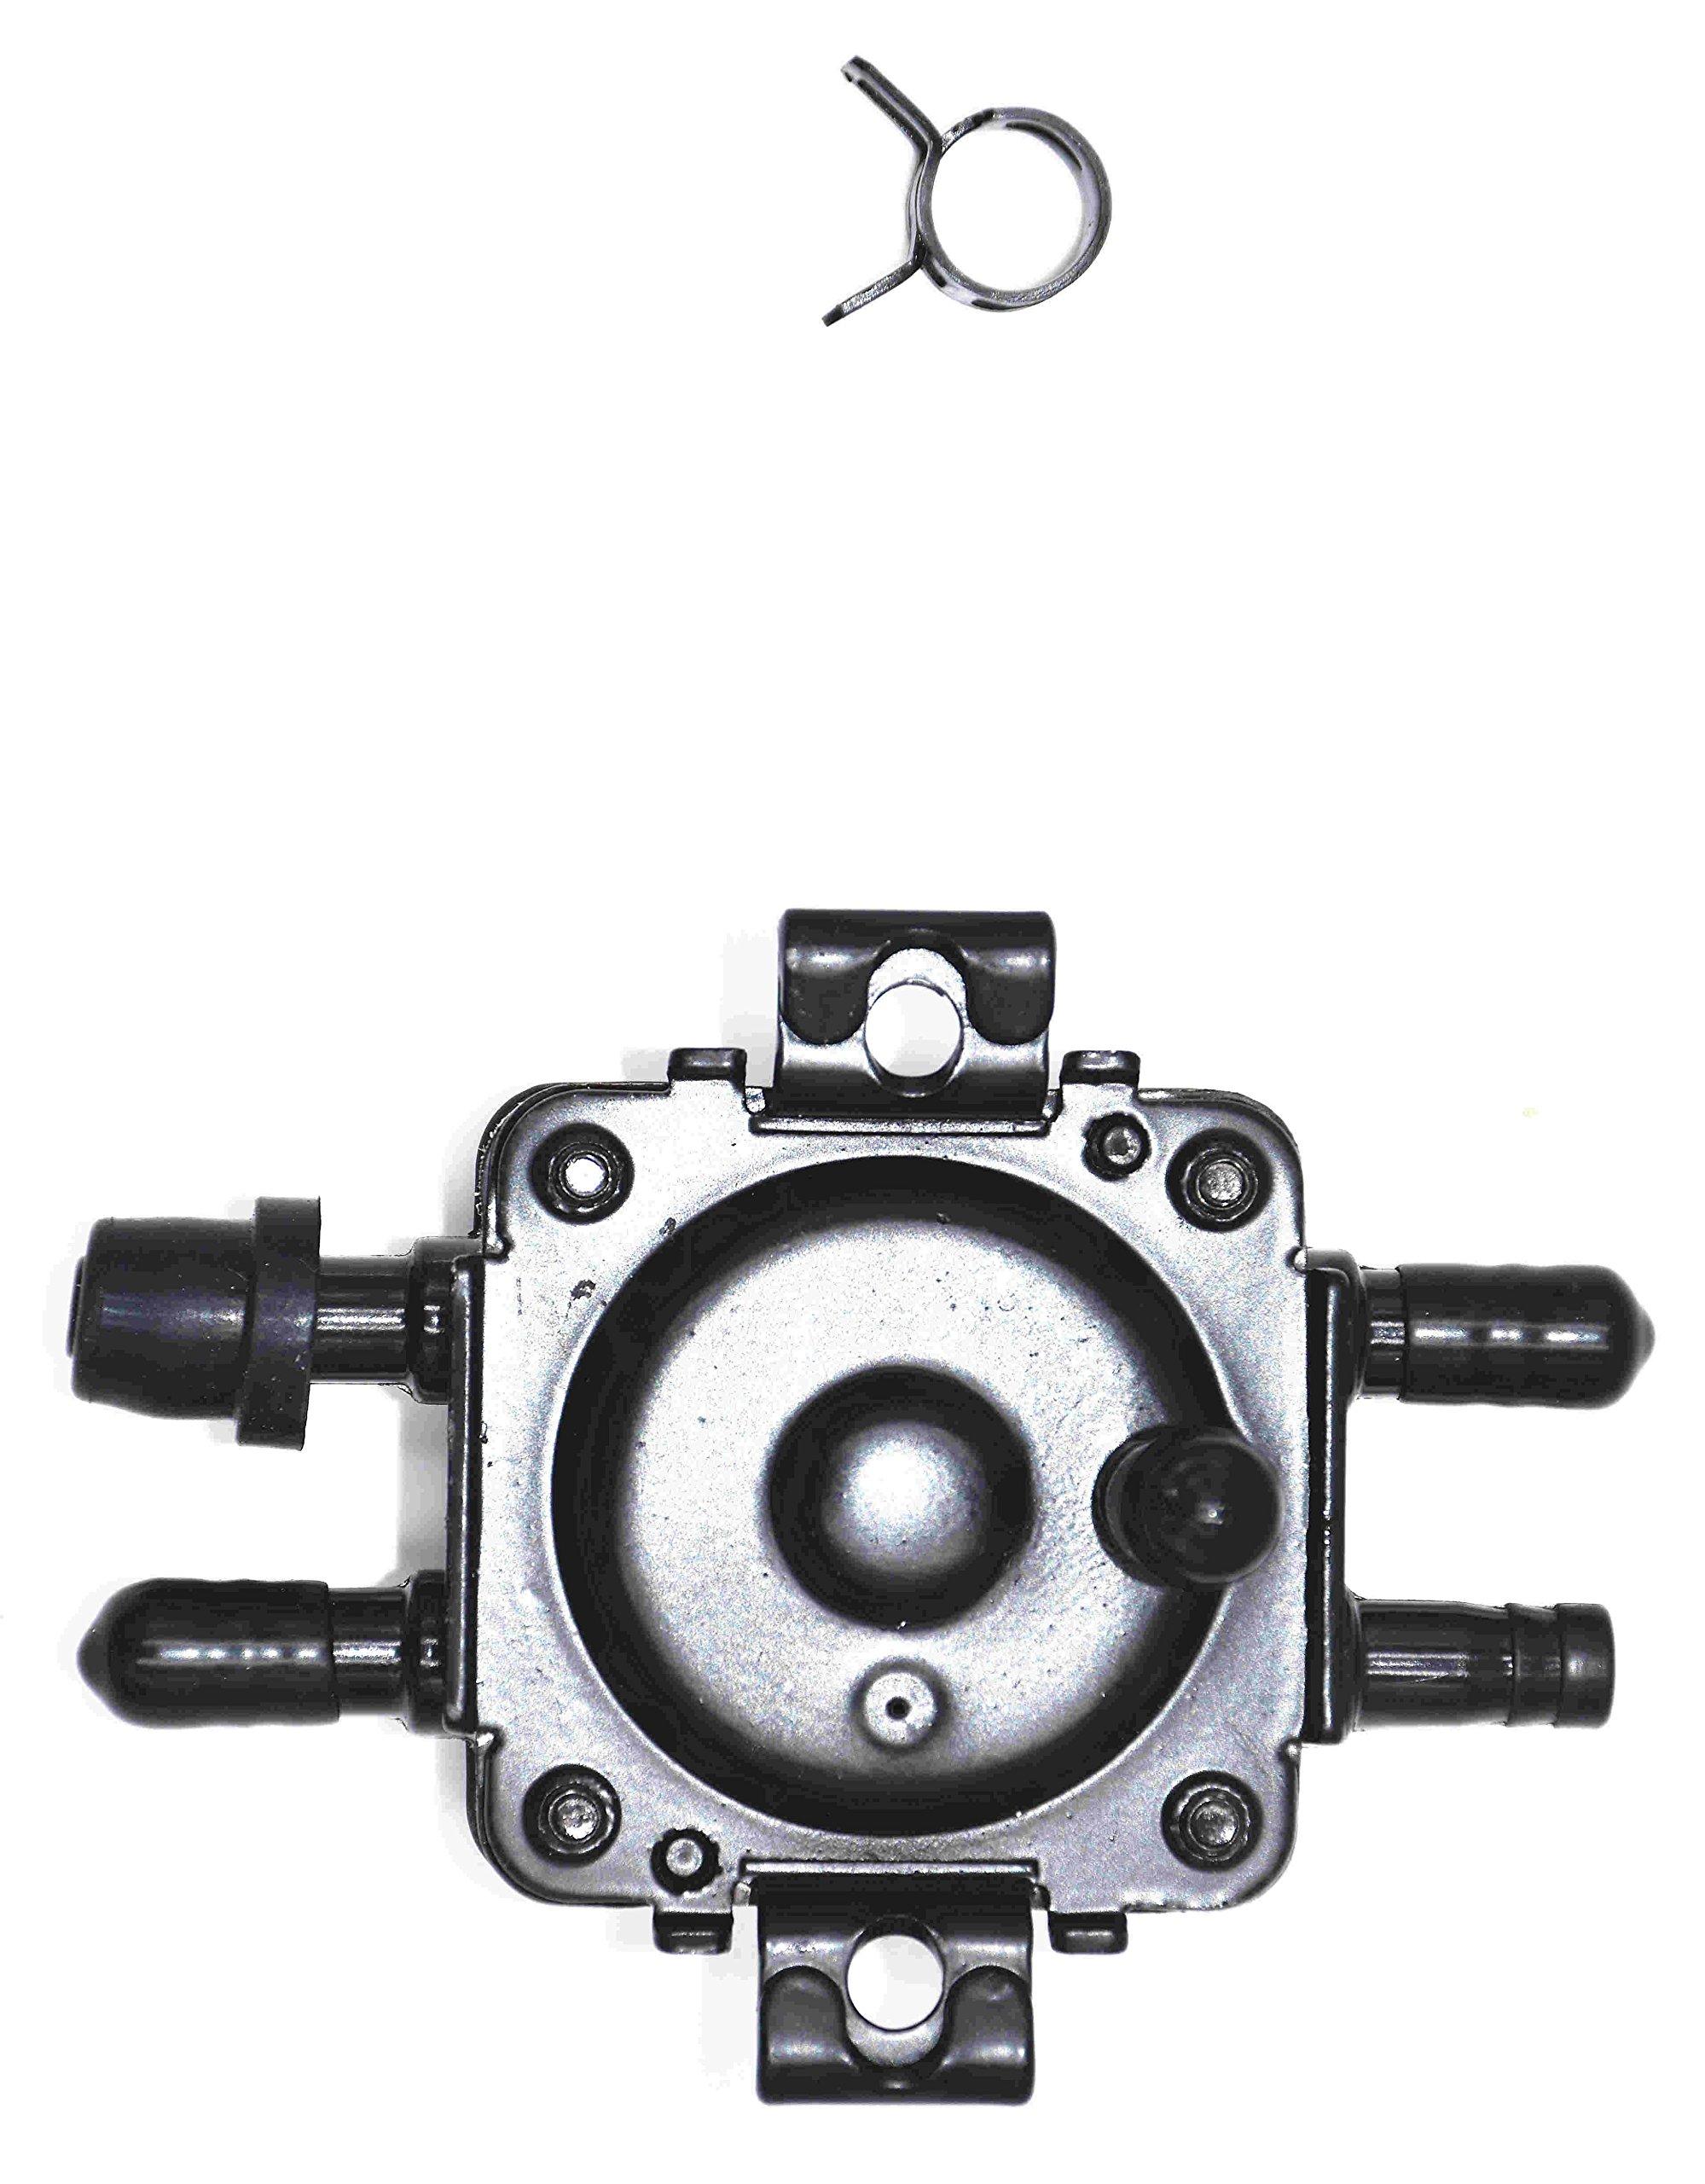 Partman Fuel Pump For 149-1982 & 149-1544 & 149-2187 Cummins Onan Generator Welder NEW